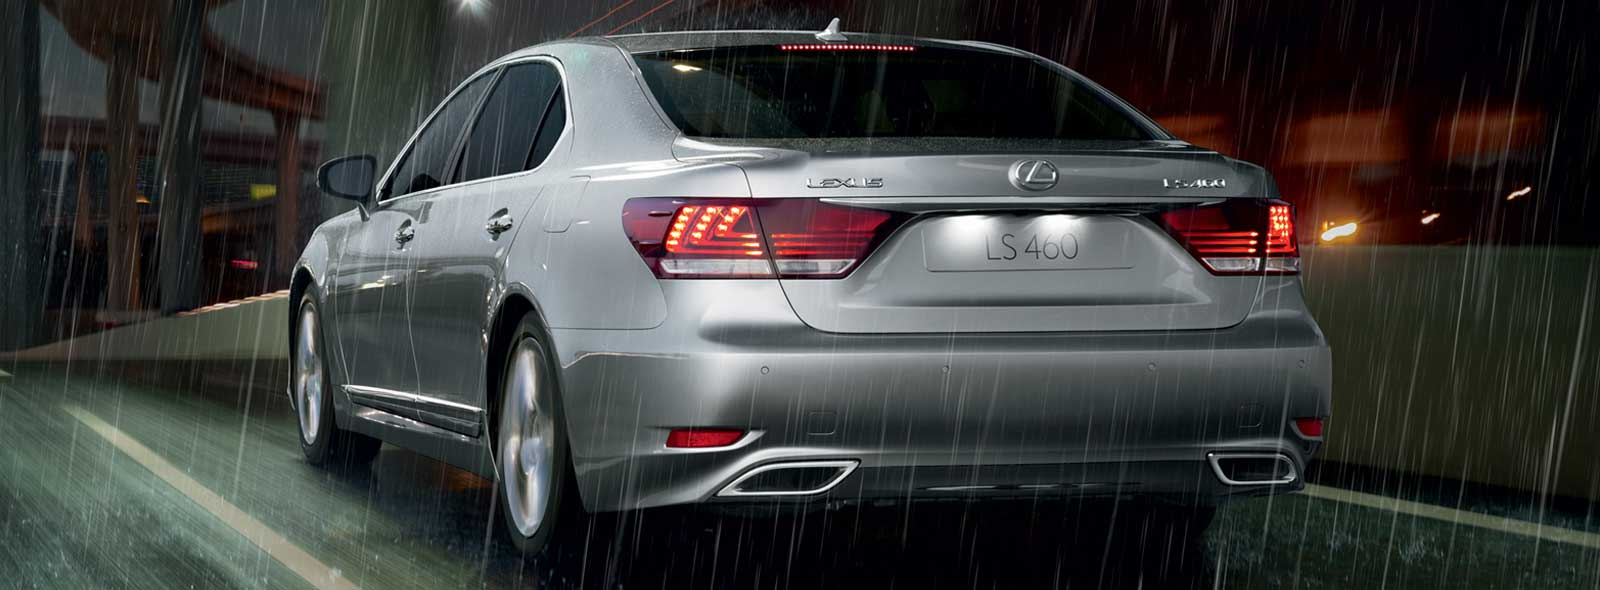 Silver Lexus LS 460